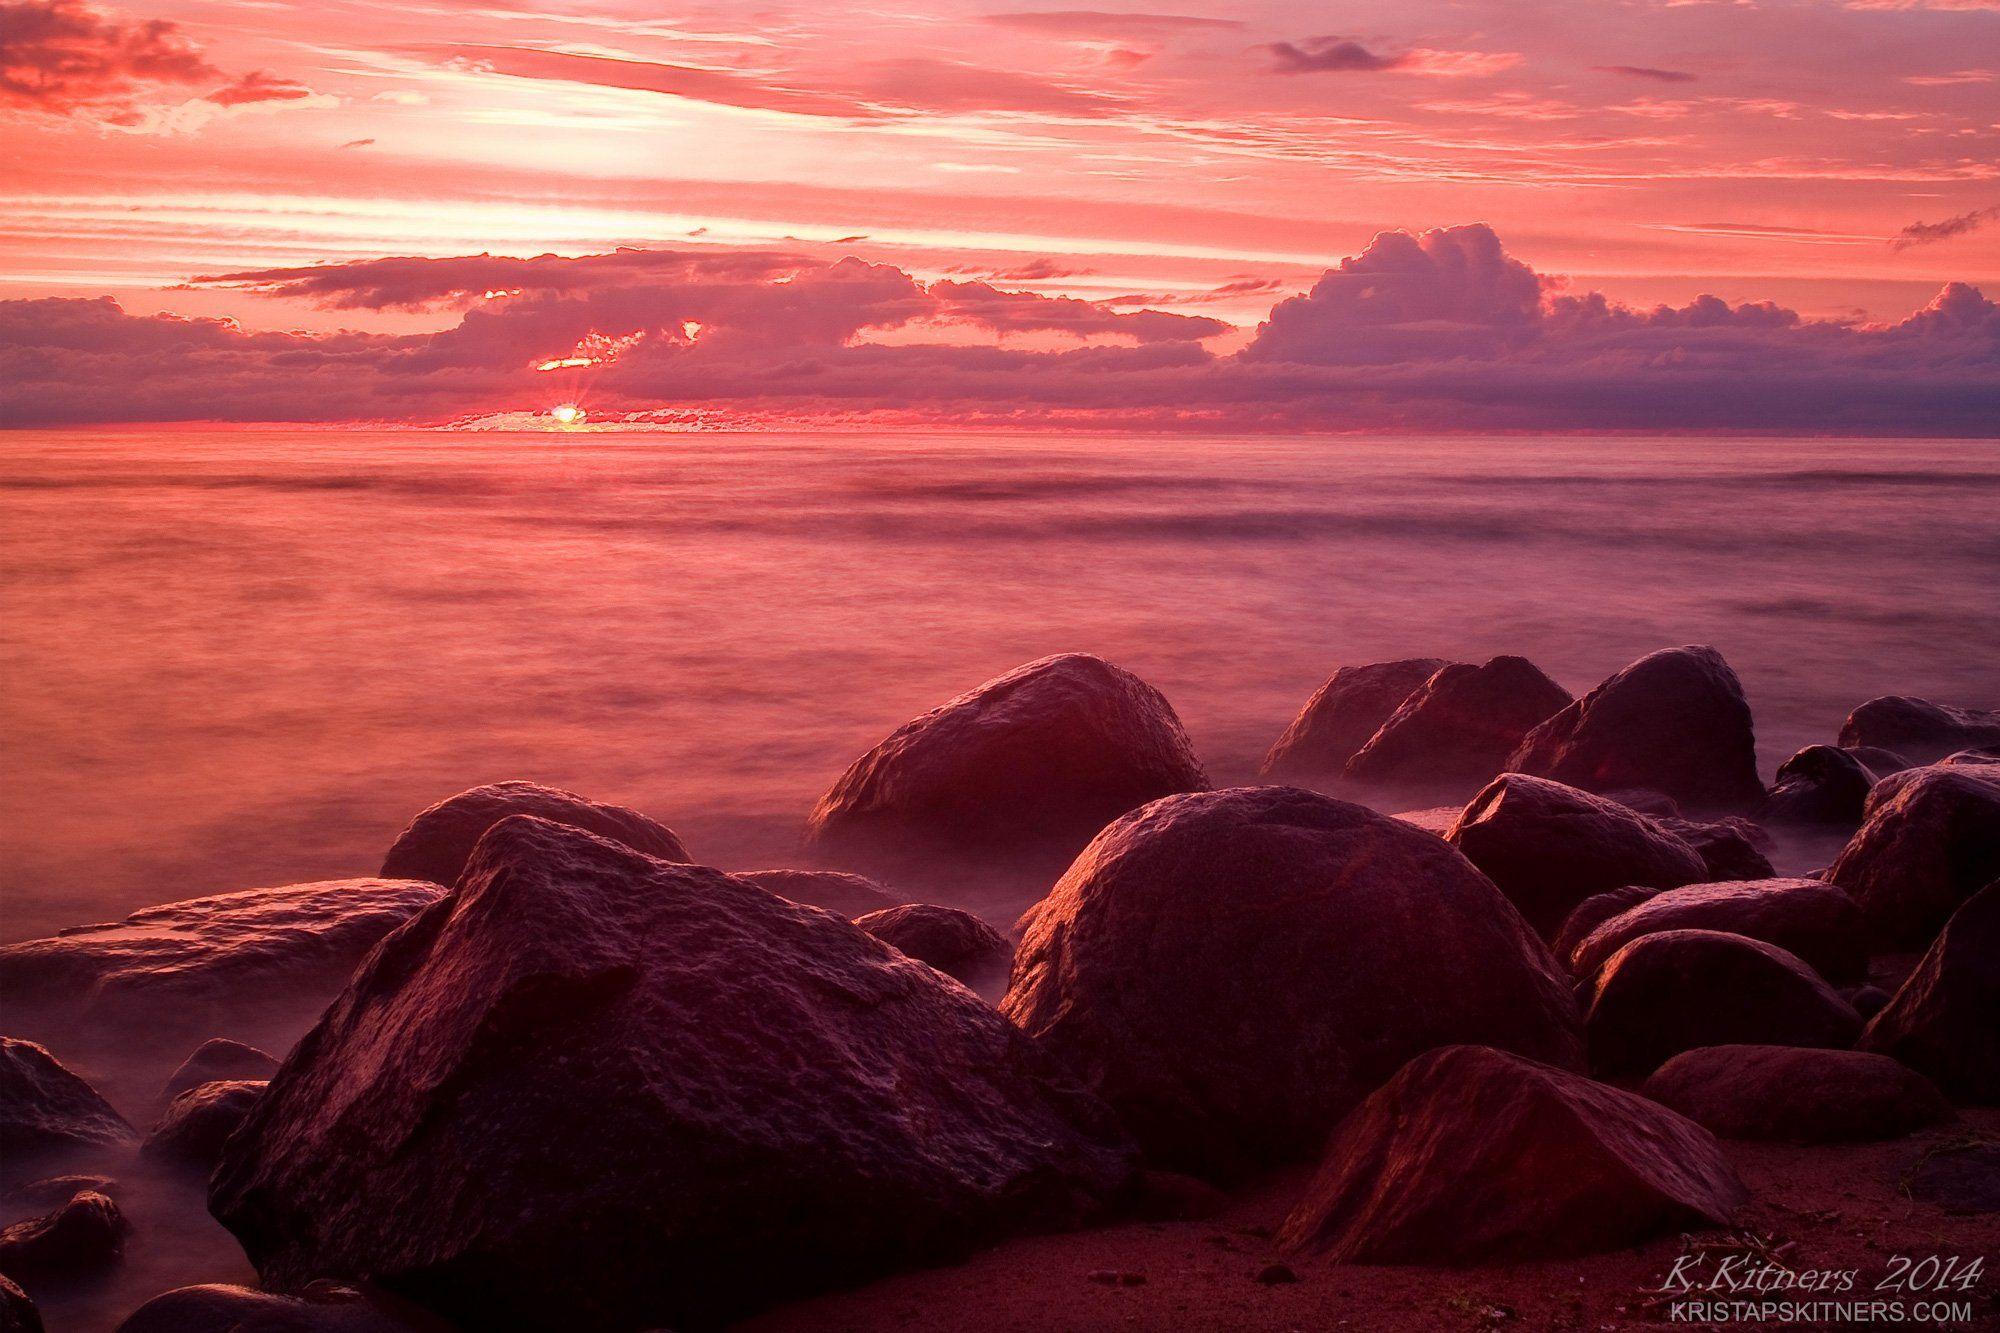 sea seascape water sky clouds stone reflection sunset evening latvia, Kristaps Kitners